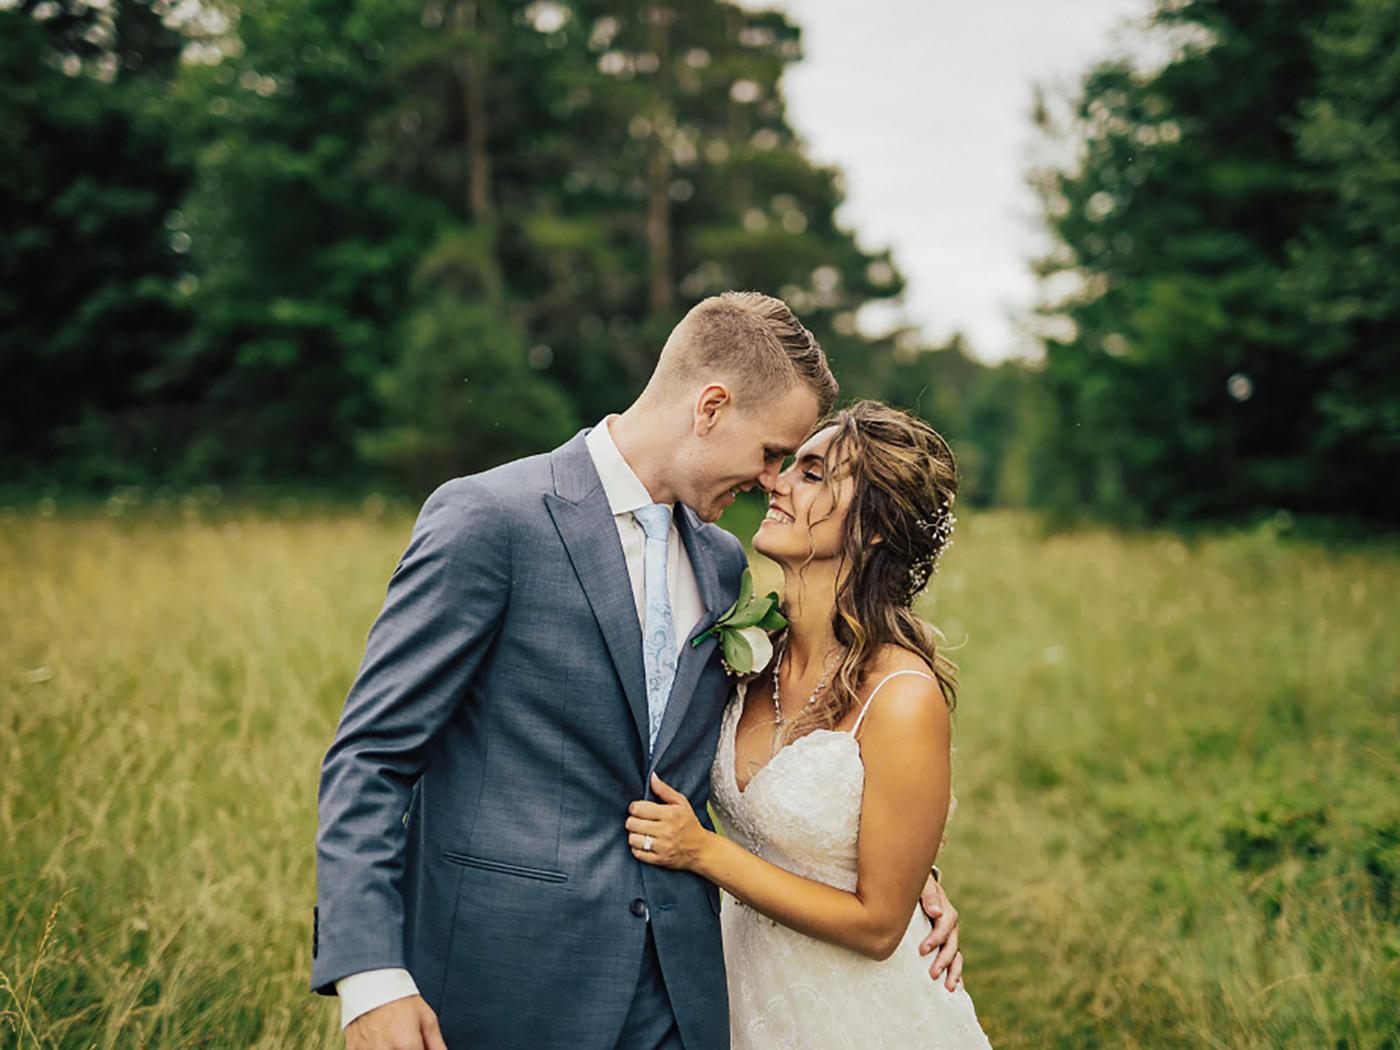 Scott & Katie's Outdoor Golf Course Wedding Videography Hamilton Ontario Elora Kitchener-Waterloo Grey Bruce Country Toronto Niagara Ontario Aidan Hennebry Hush Hush Photography & Film Wedding Films Videography.jpg